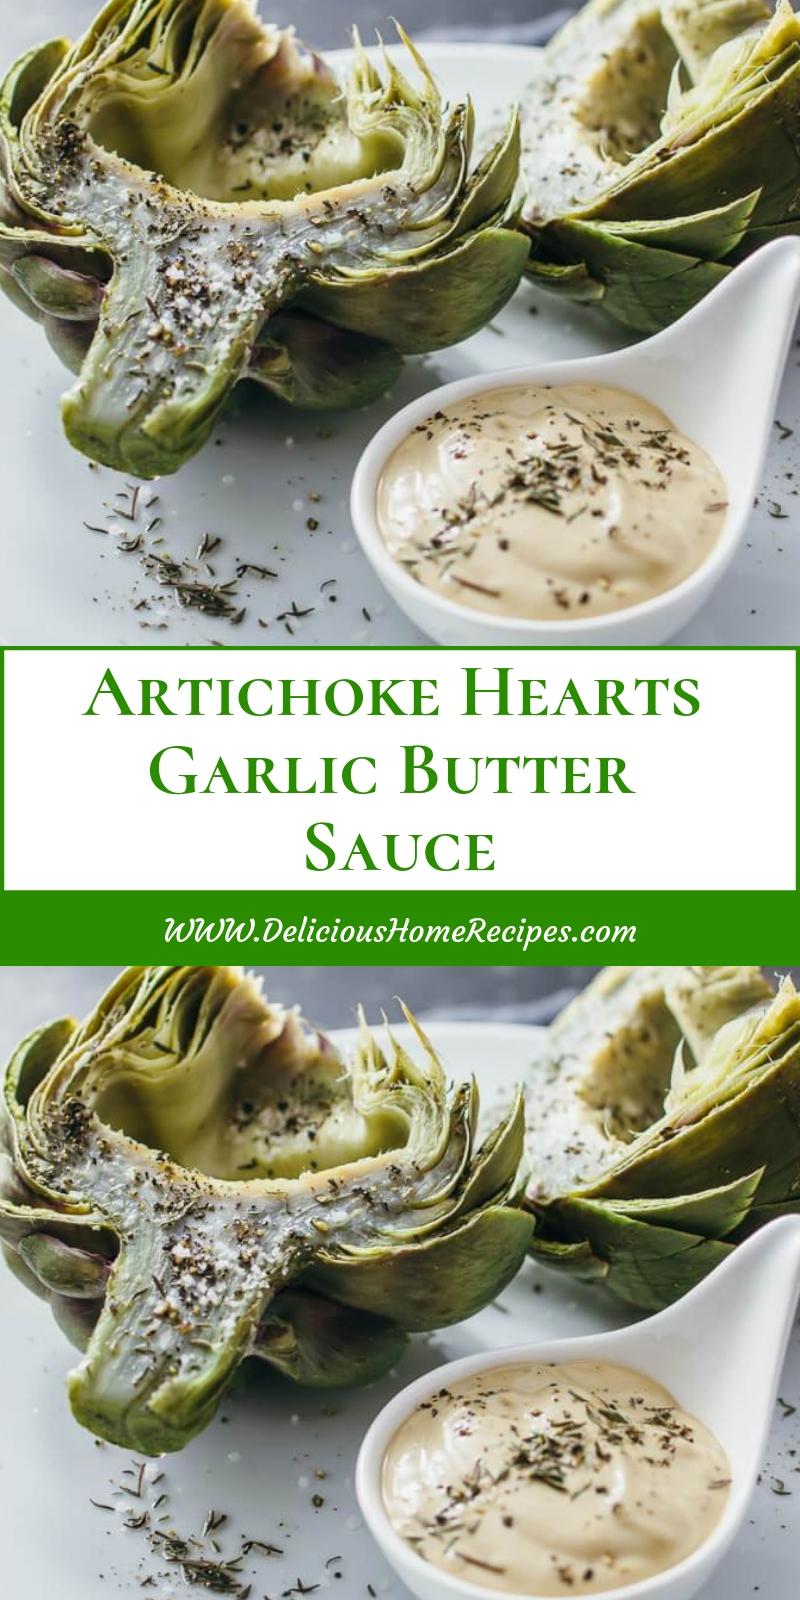 Artichoke Hearts Garlic Butter Sauce